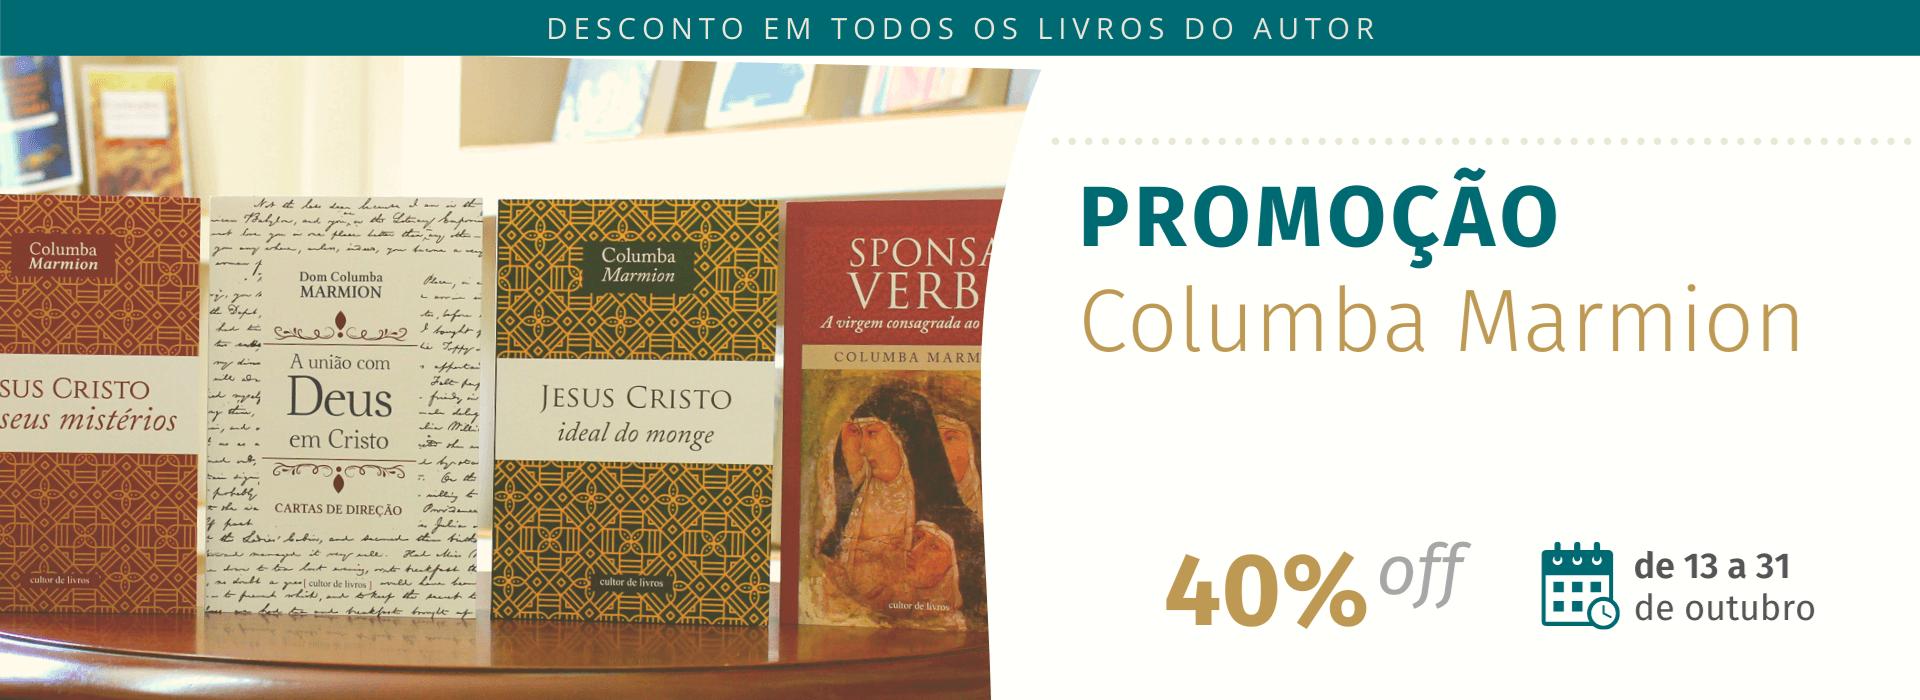 Promoção Columba Marmion